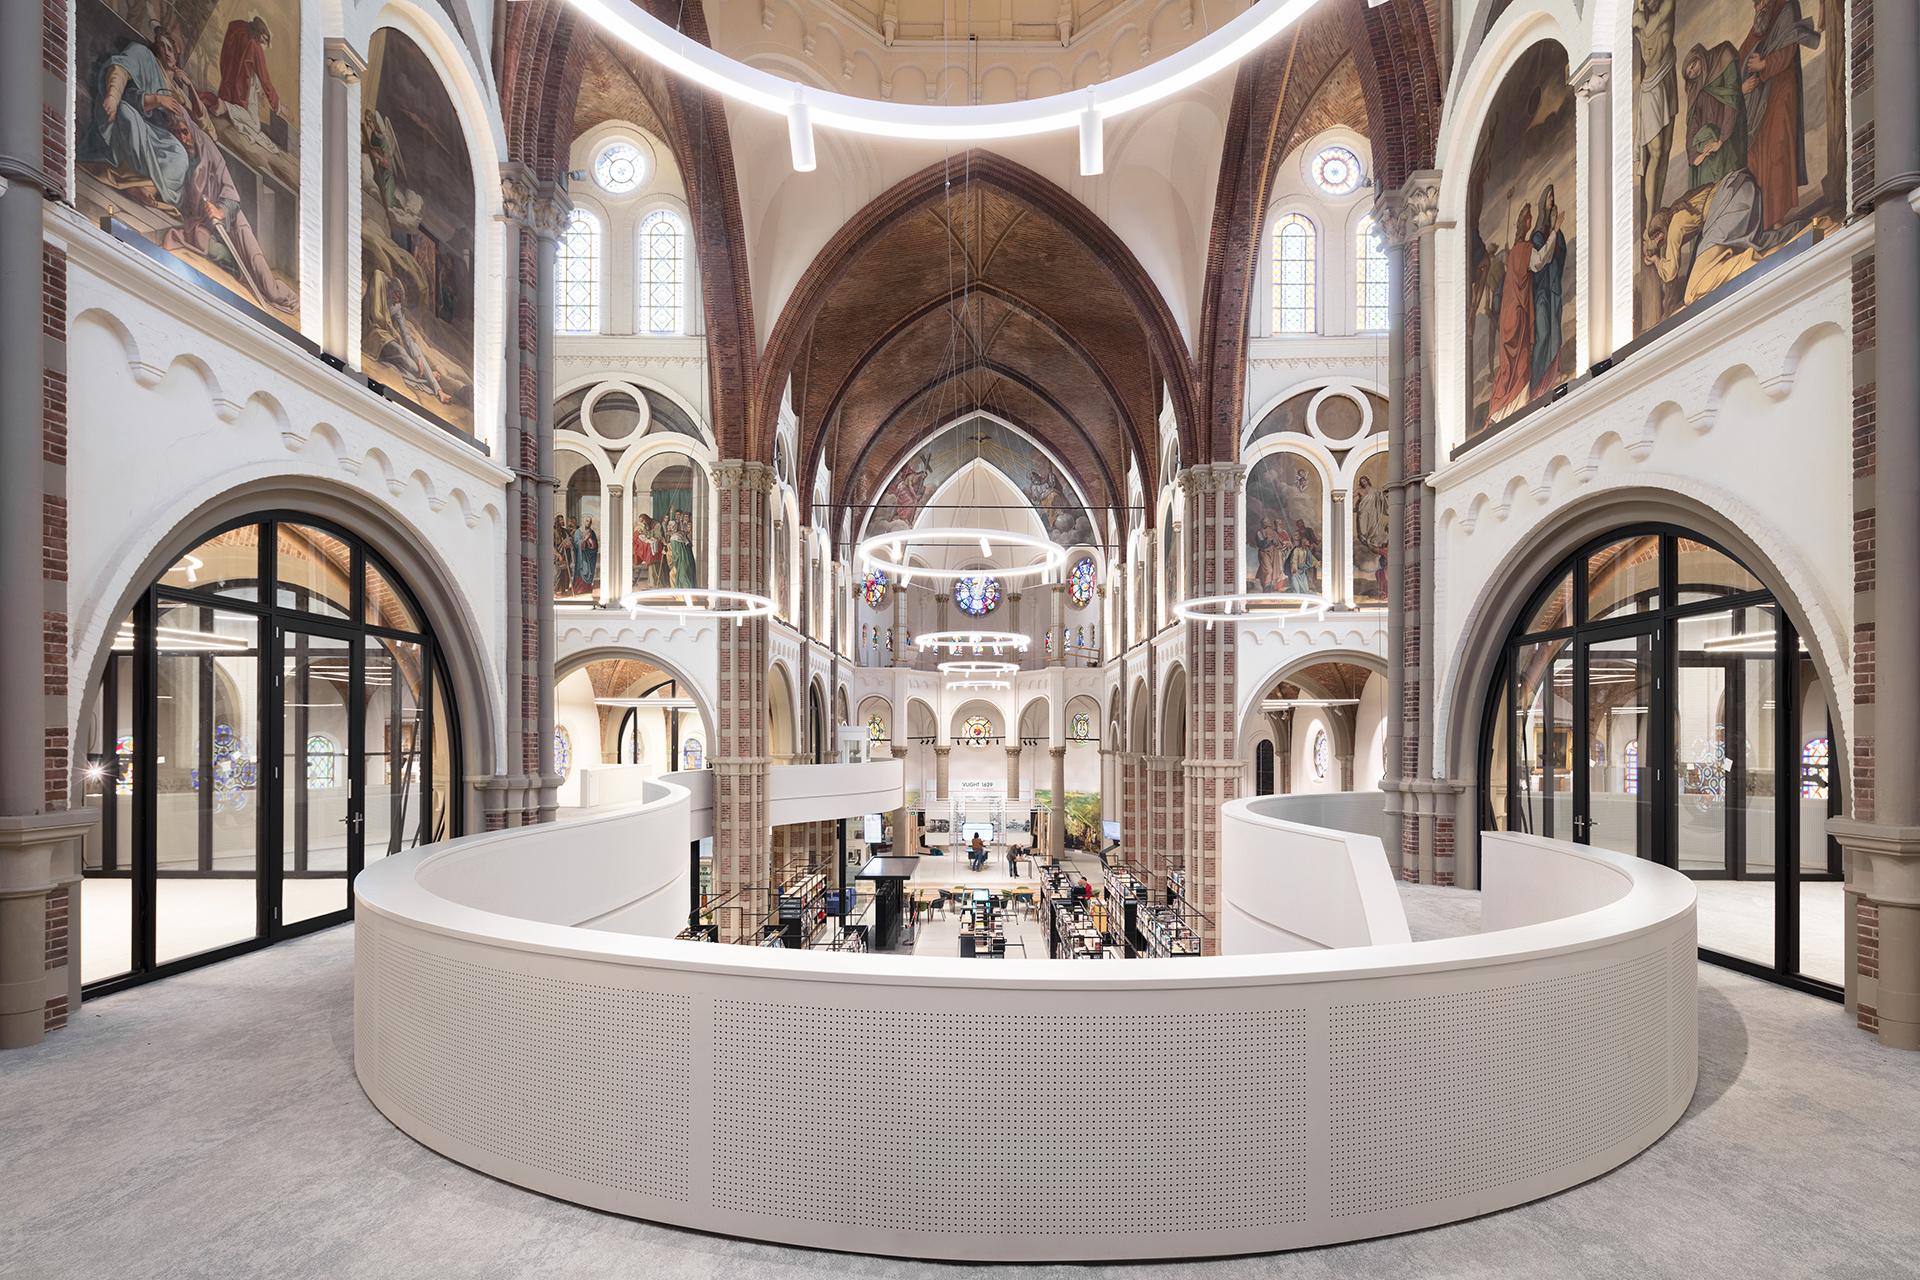 SP2018-Kerk-Bibliotheek-DePetrus-1-HiRes